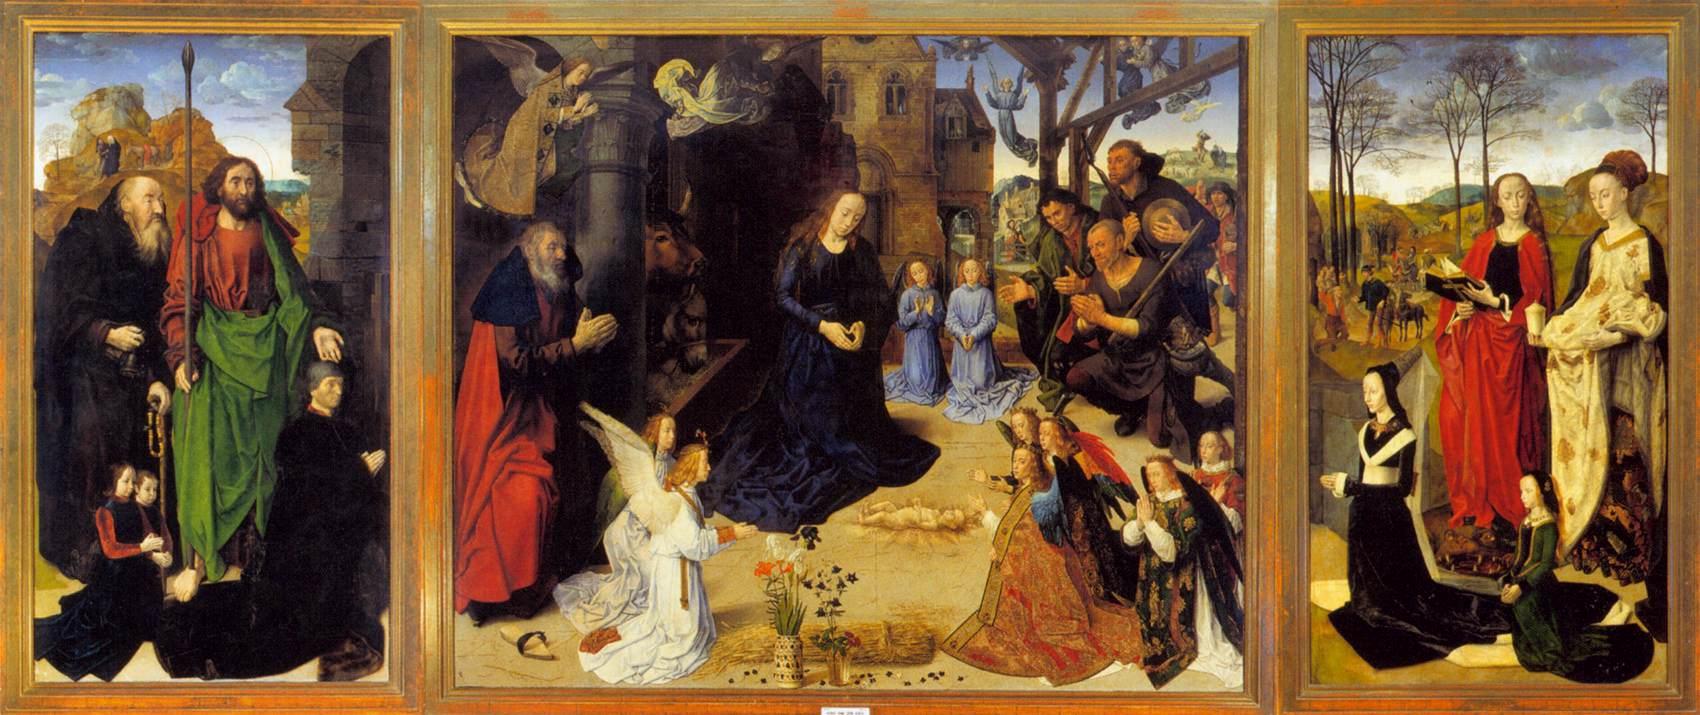 portinari altarpiece by hugo van der goes